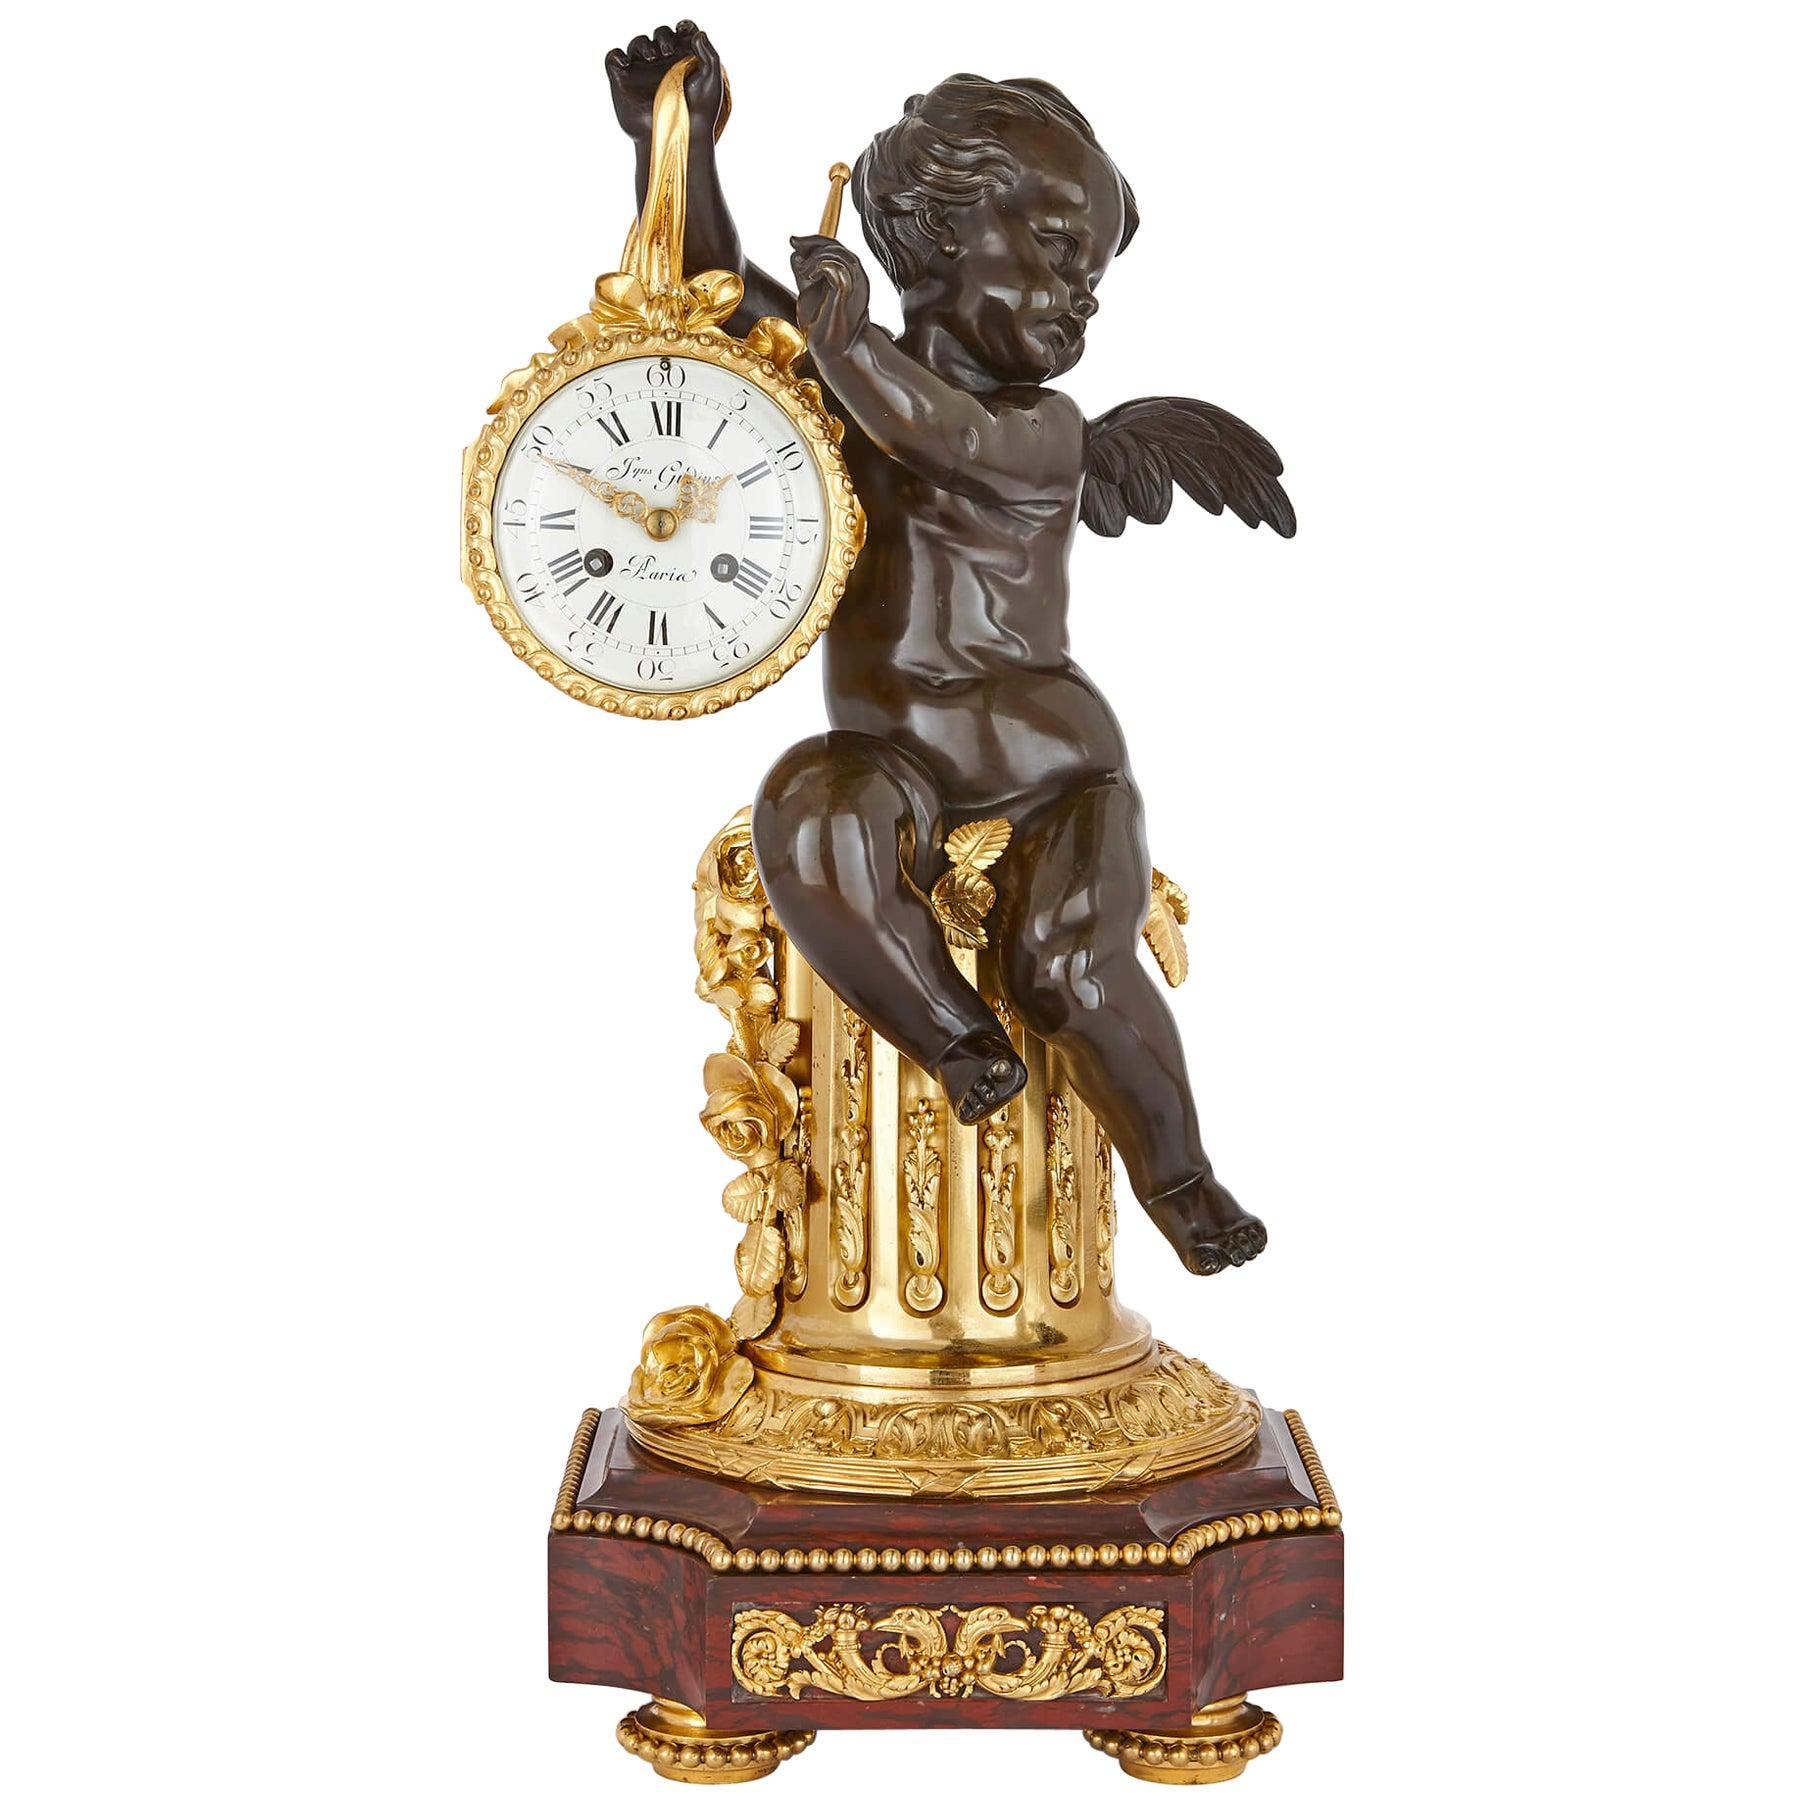 19th Century Ormolu and Marble Mantel Clock